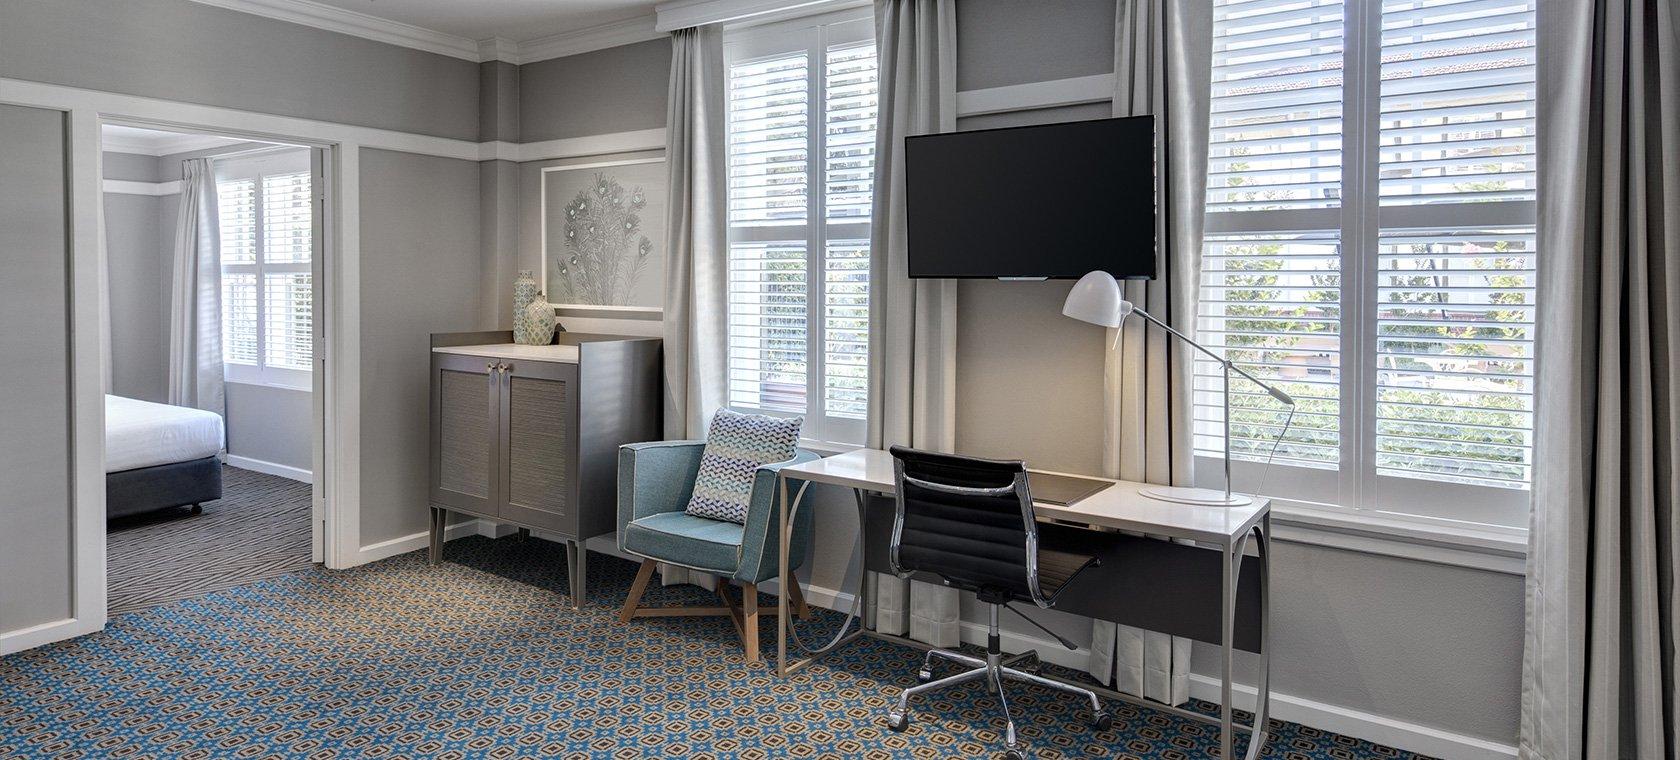 hotel-kurrajong-canberra-executive-suite-lounge-room-02-2016.66-1.jpg